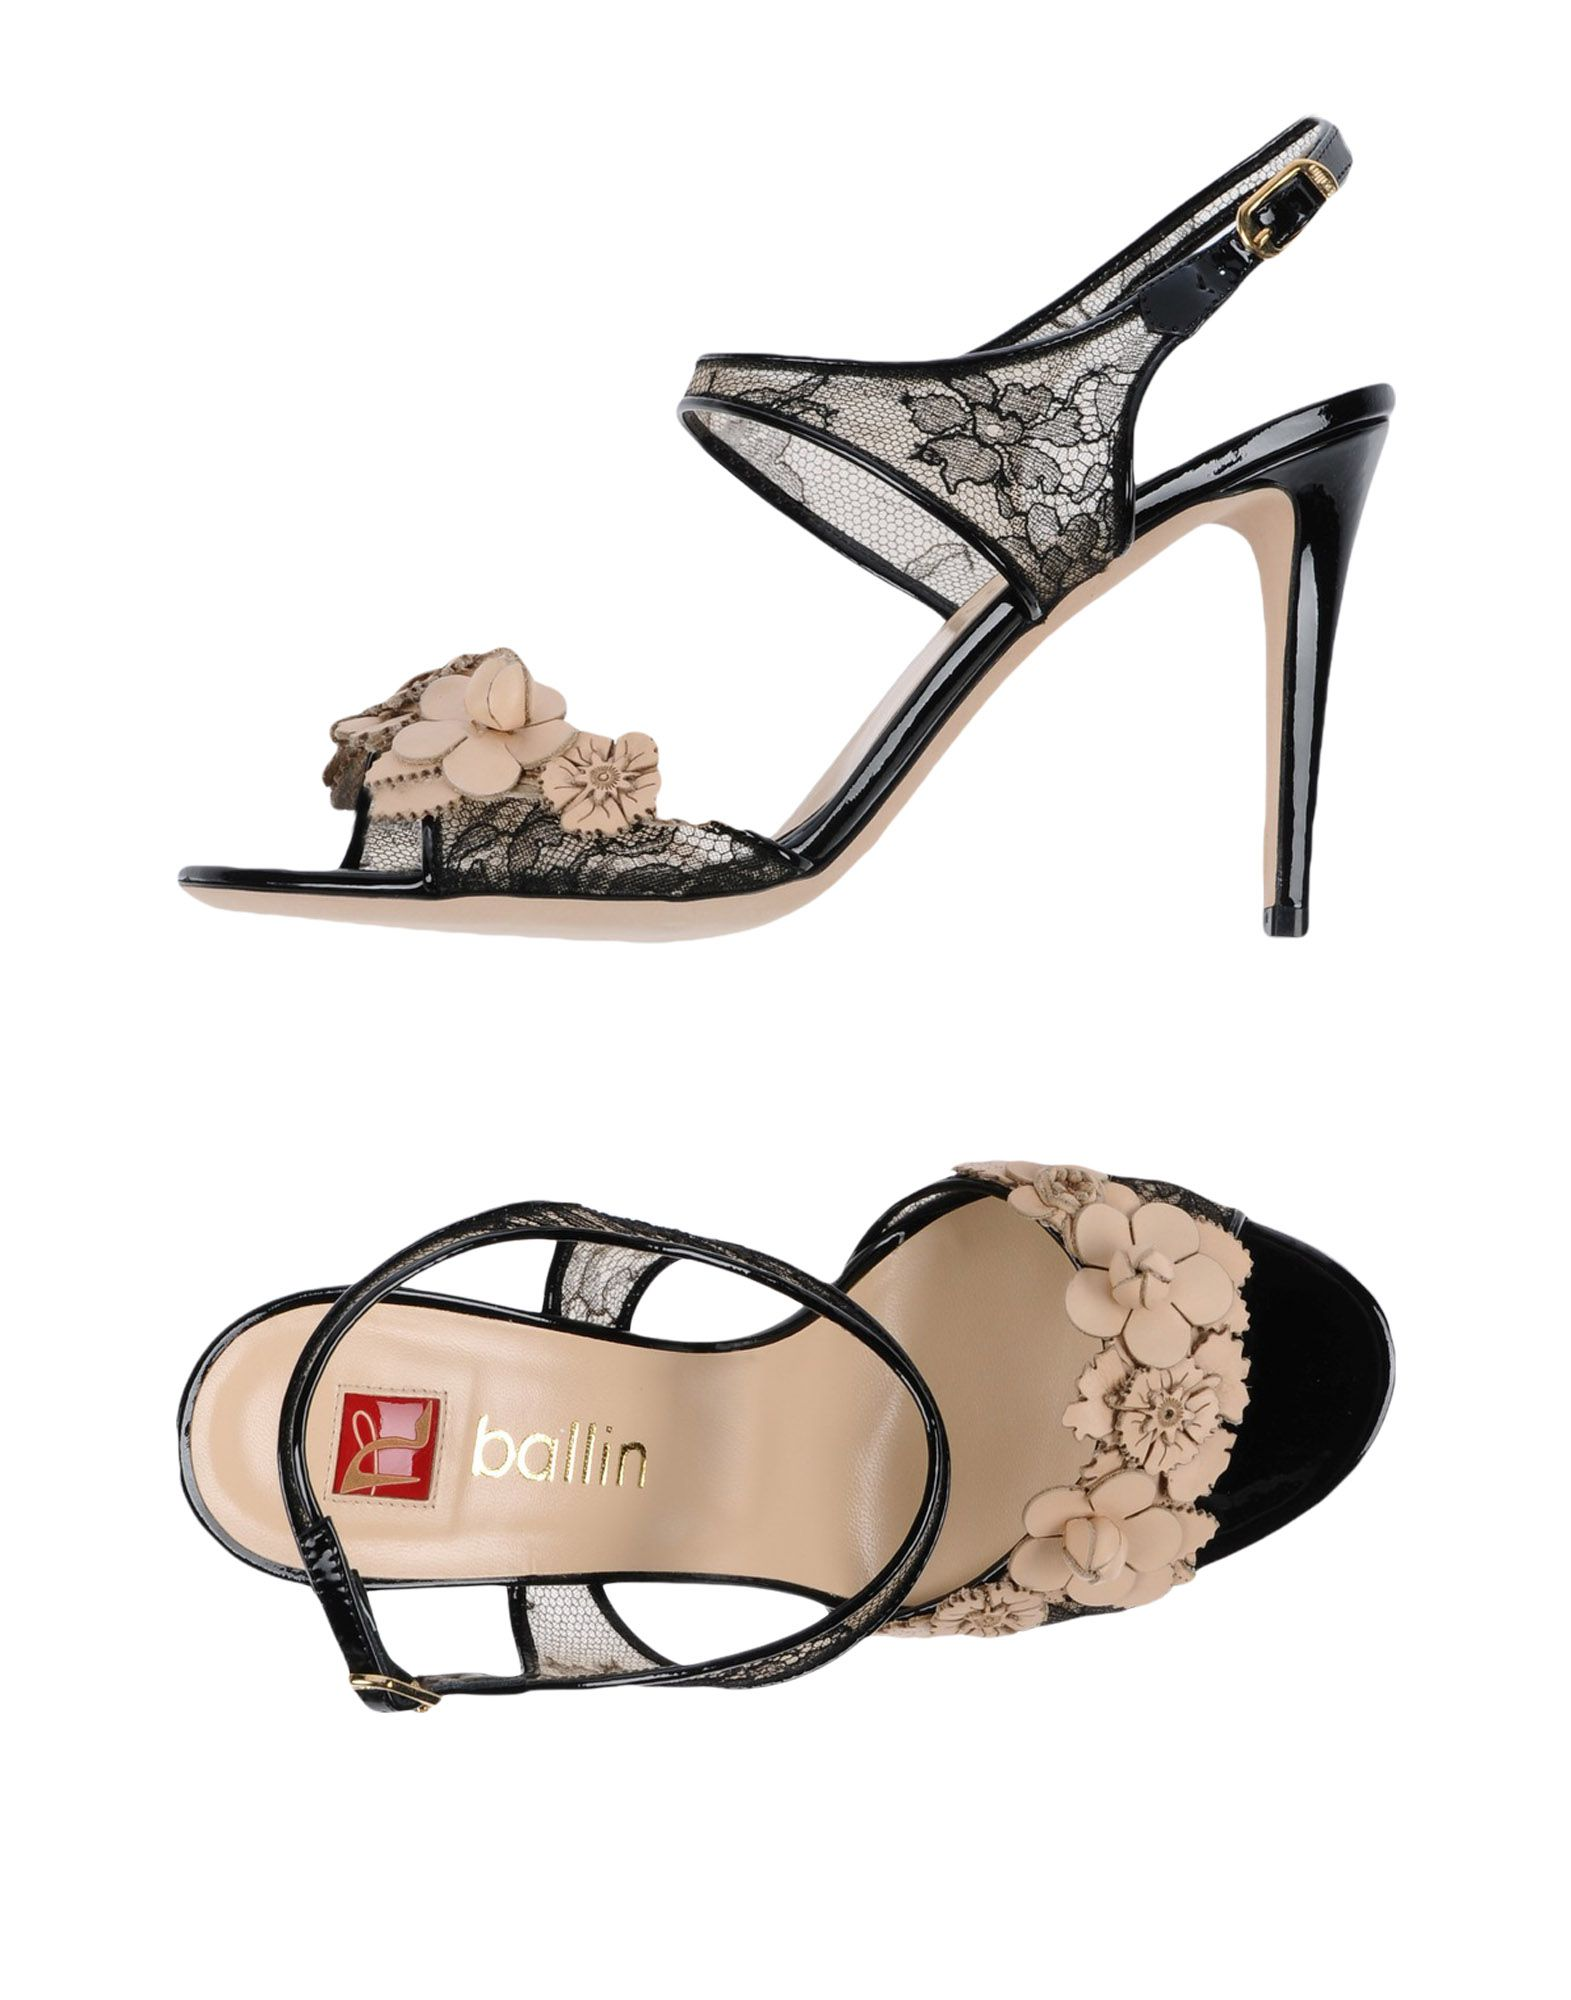 Ballin Damen Sandalen Damen Ballin  11452150UT Heiße Schuhe 9efbe9